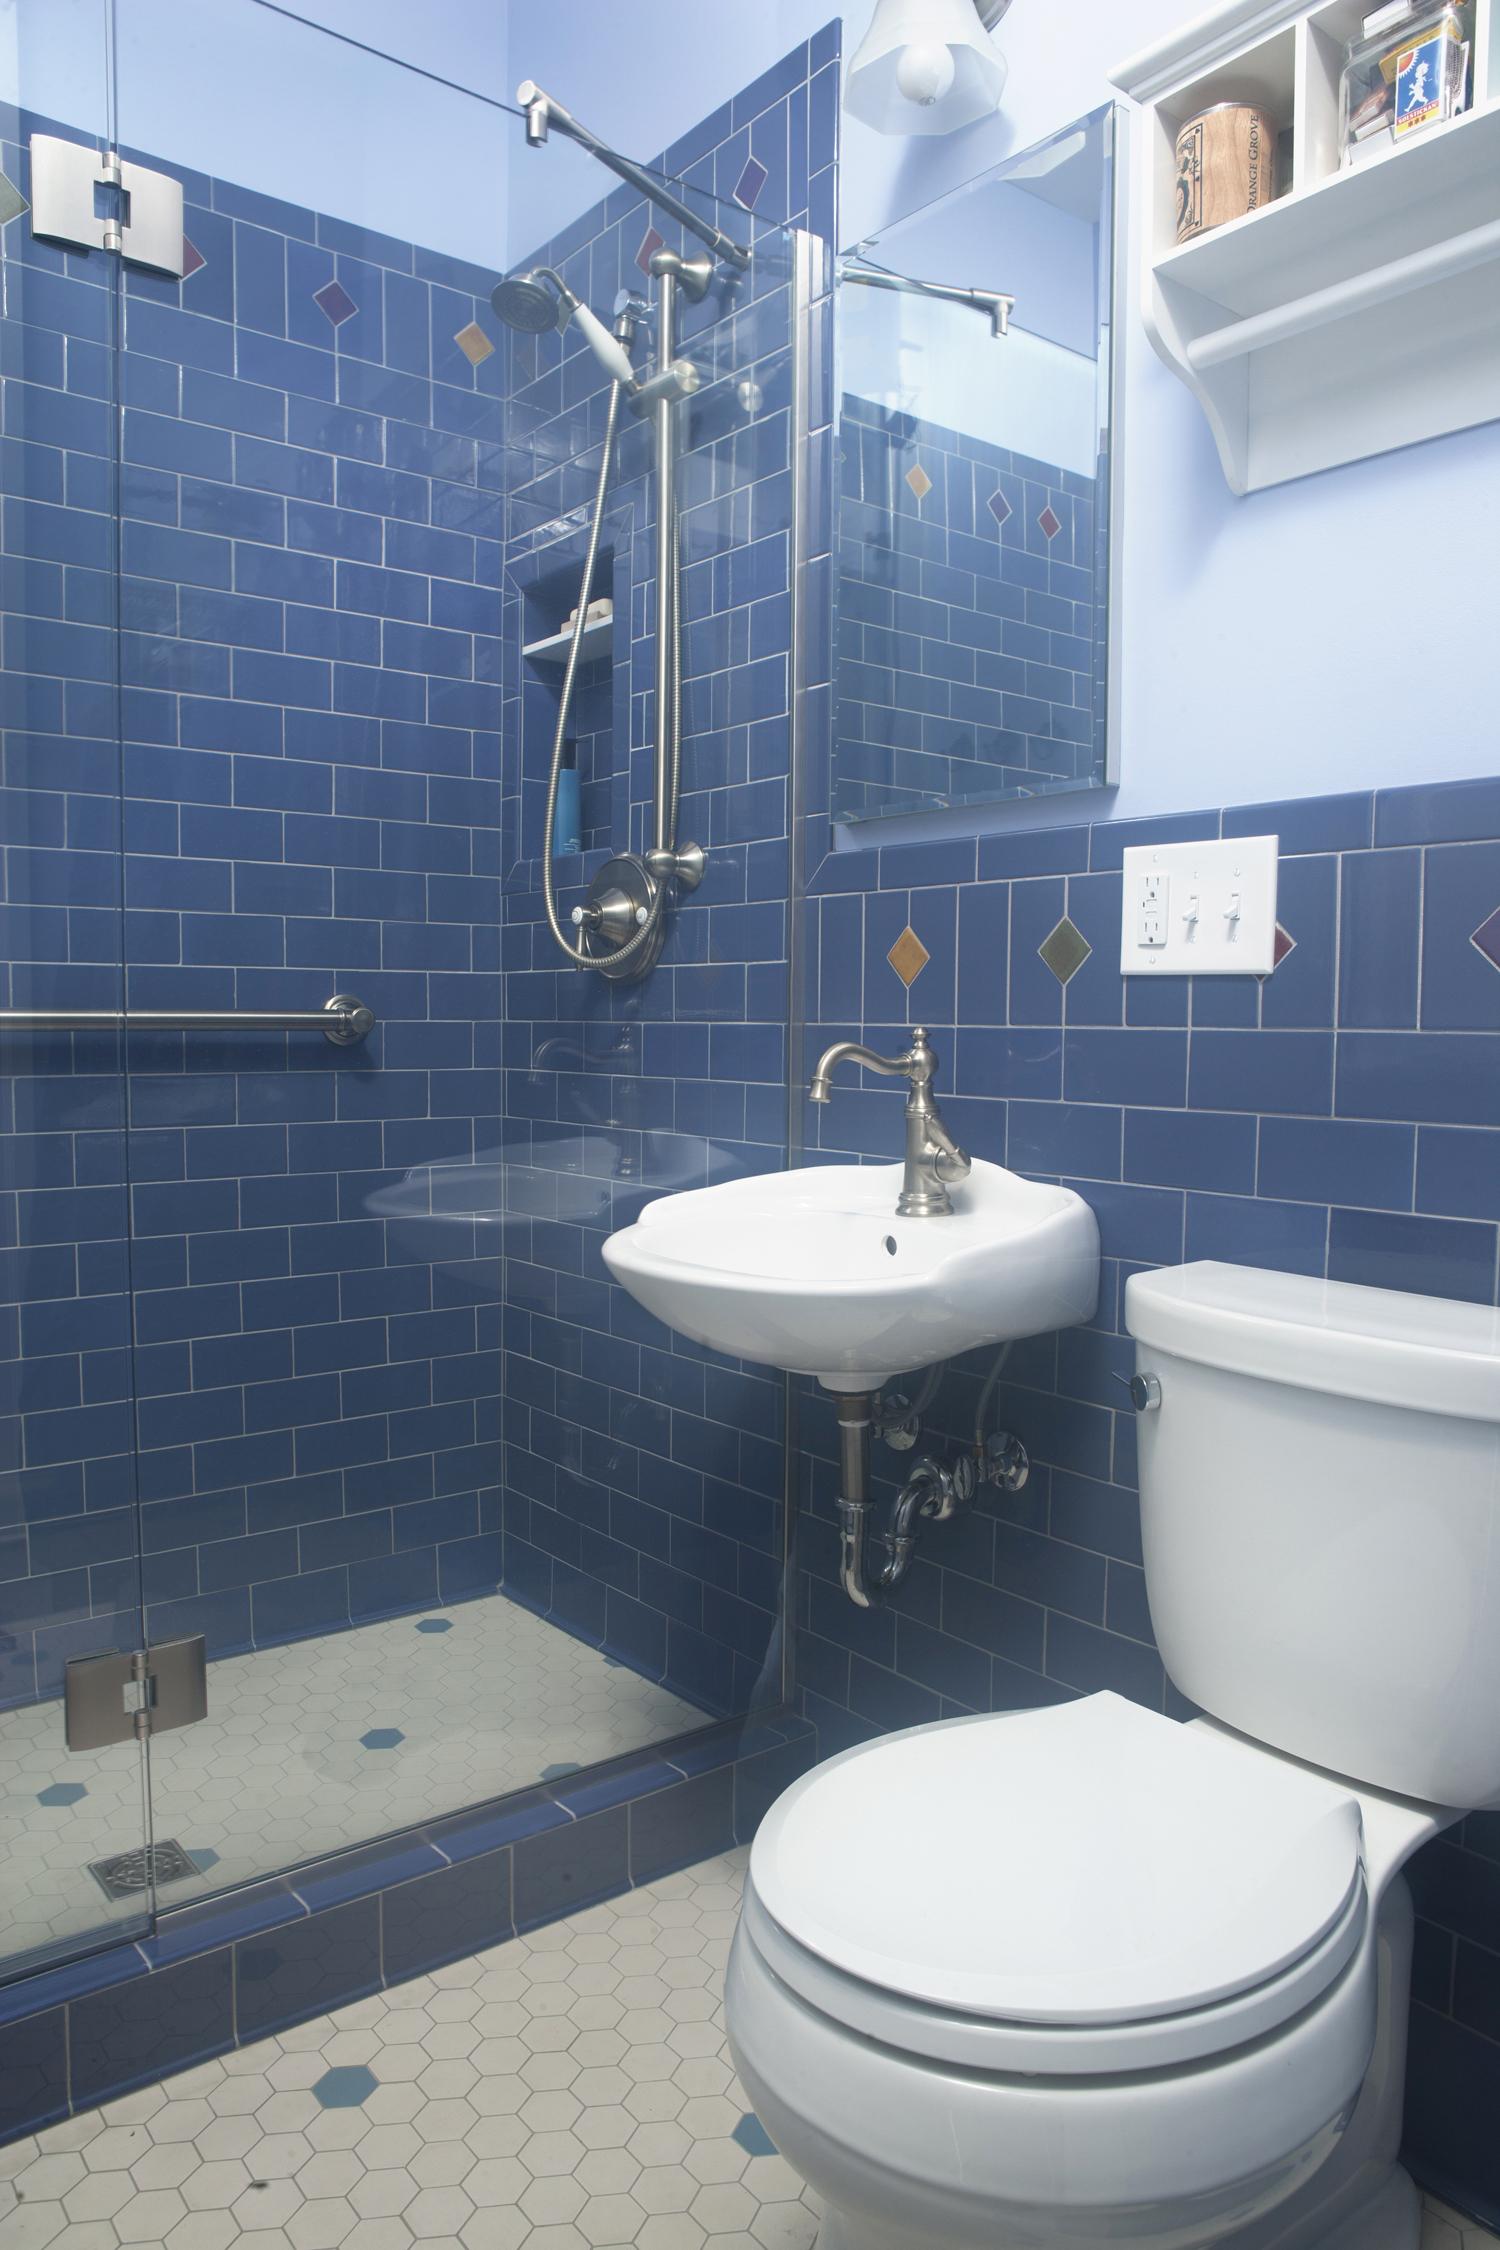 Blueberry Subway Nirvana Bathroom Tile Floor And Walls